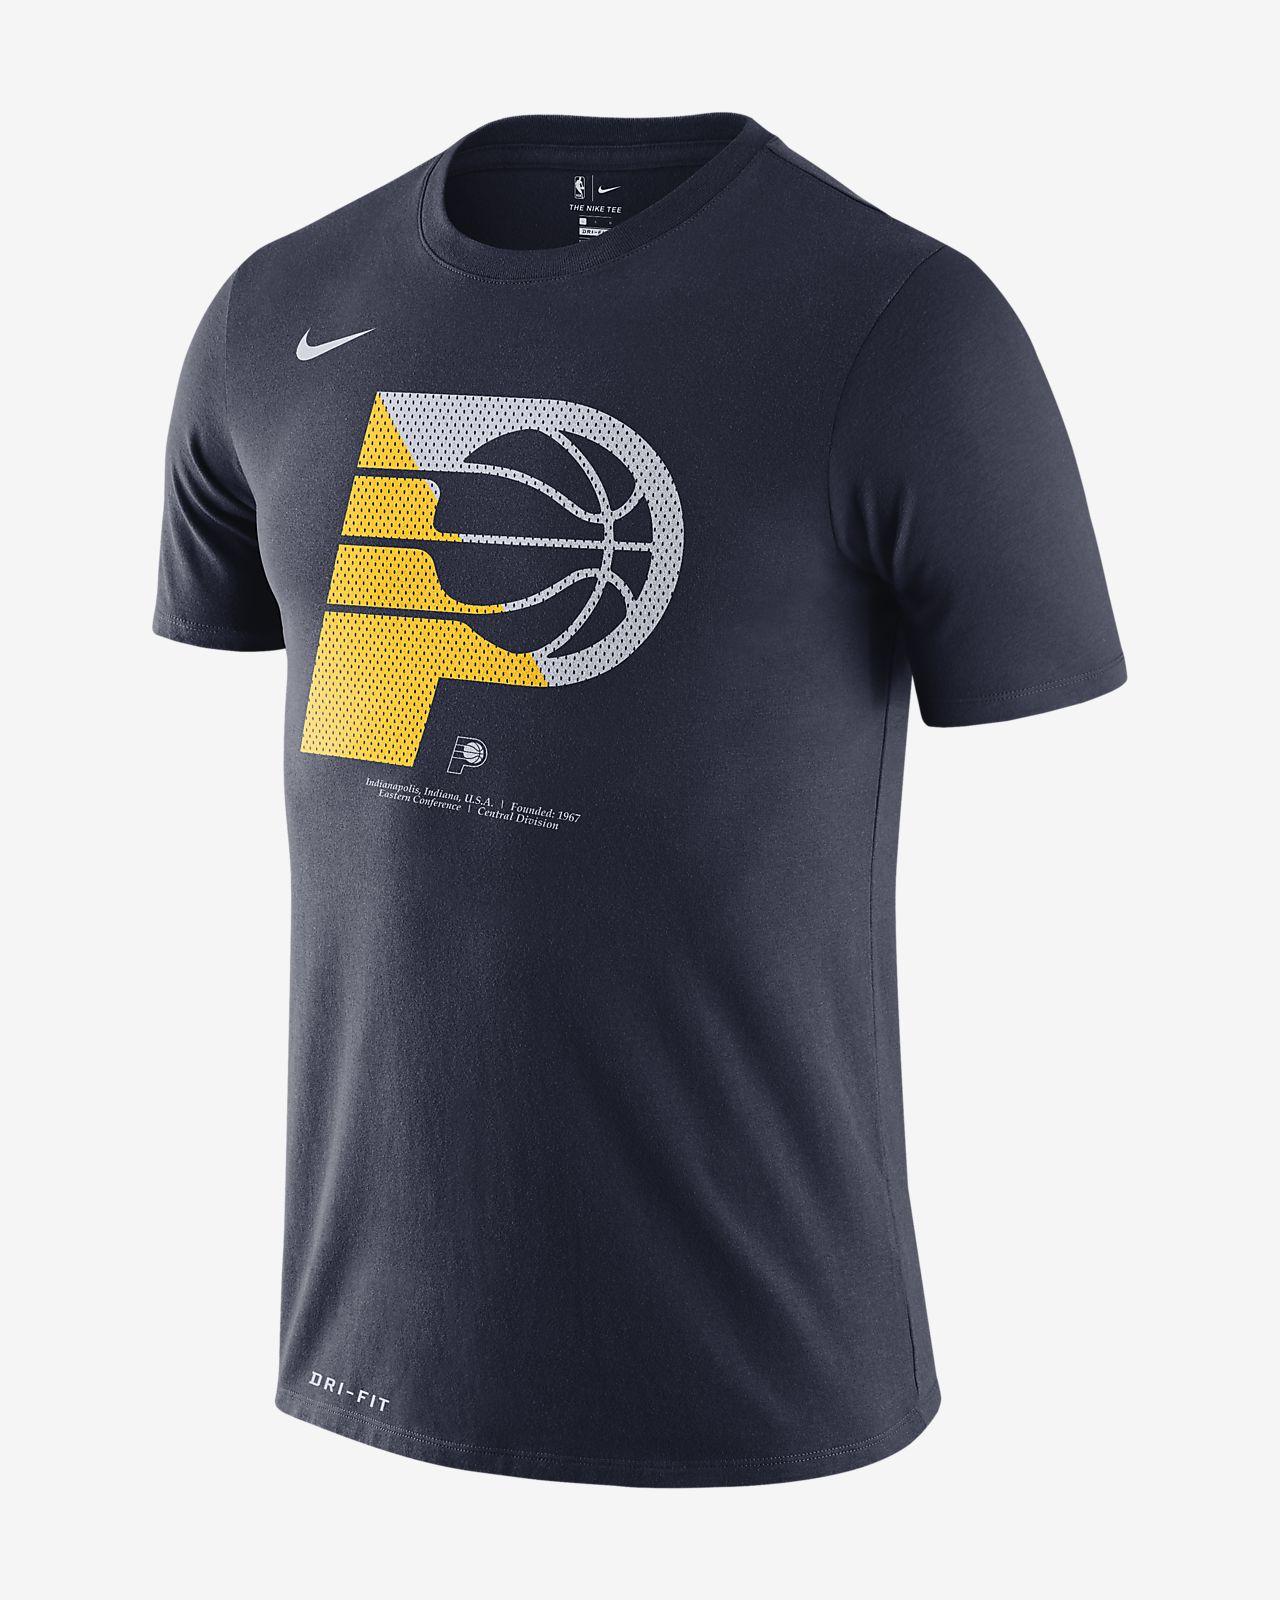 Indiana Pacers Nike Dri-FIT NBA-herenshirt